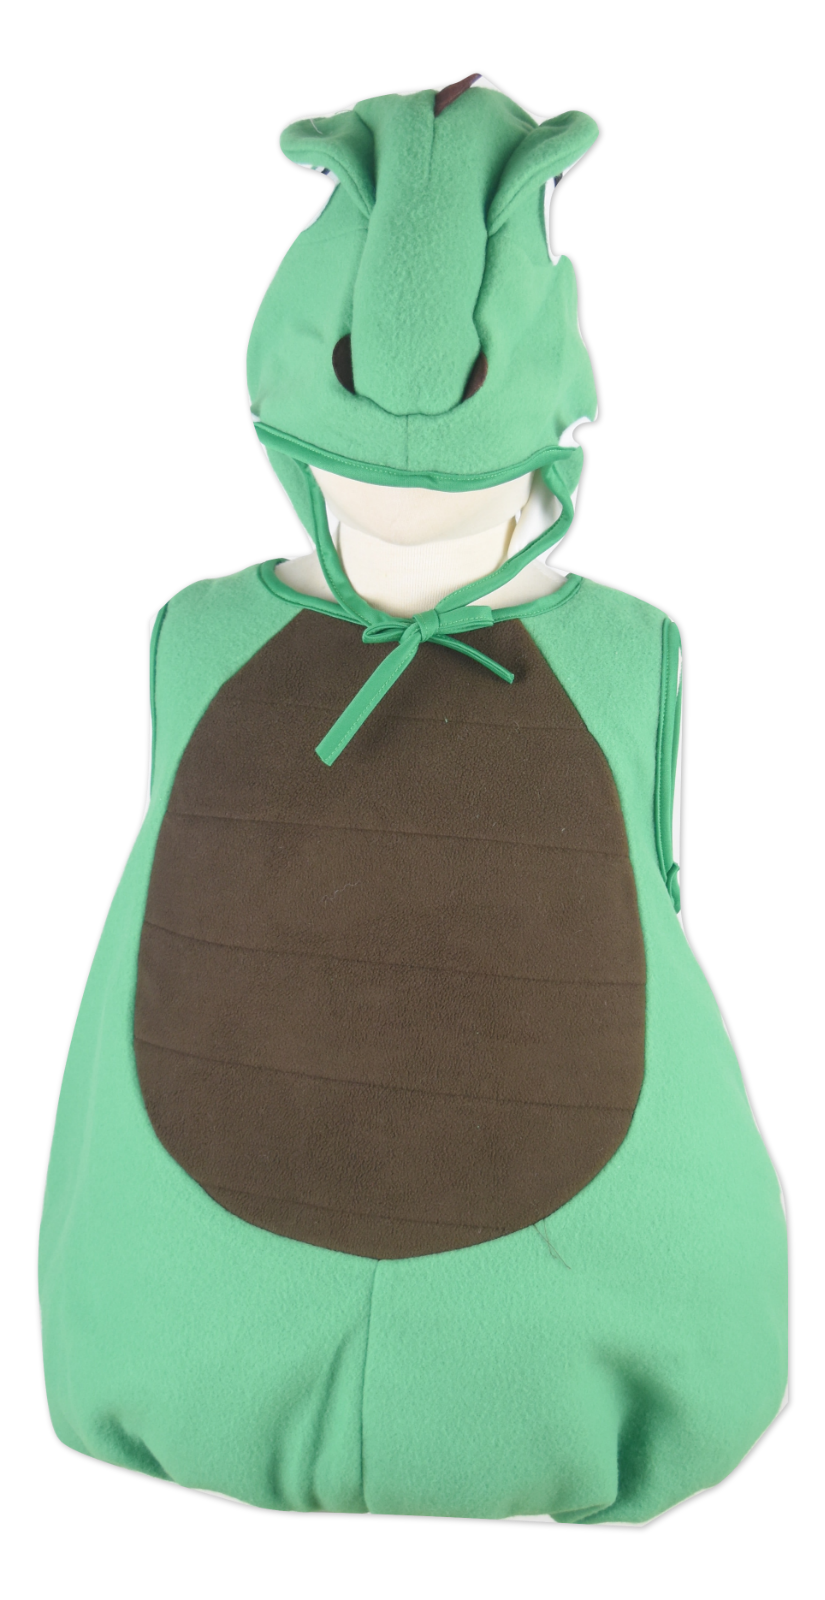 X射線【W390007】恐龍蓬蓬裝(綠),暴龍/化妝舞會/角色扮演/尾牙表演/萬聖節服裝/聖誕節/兒童變裝/表演/攝影/寫真